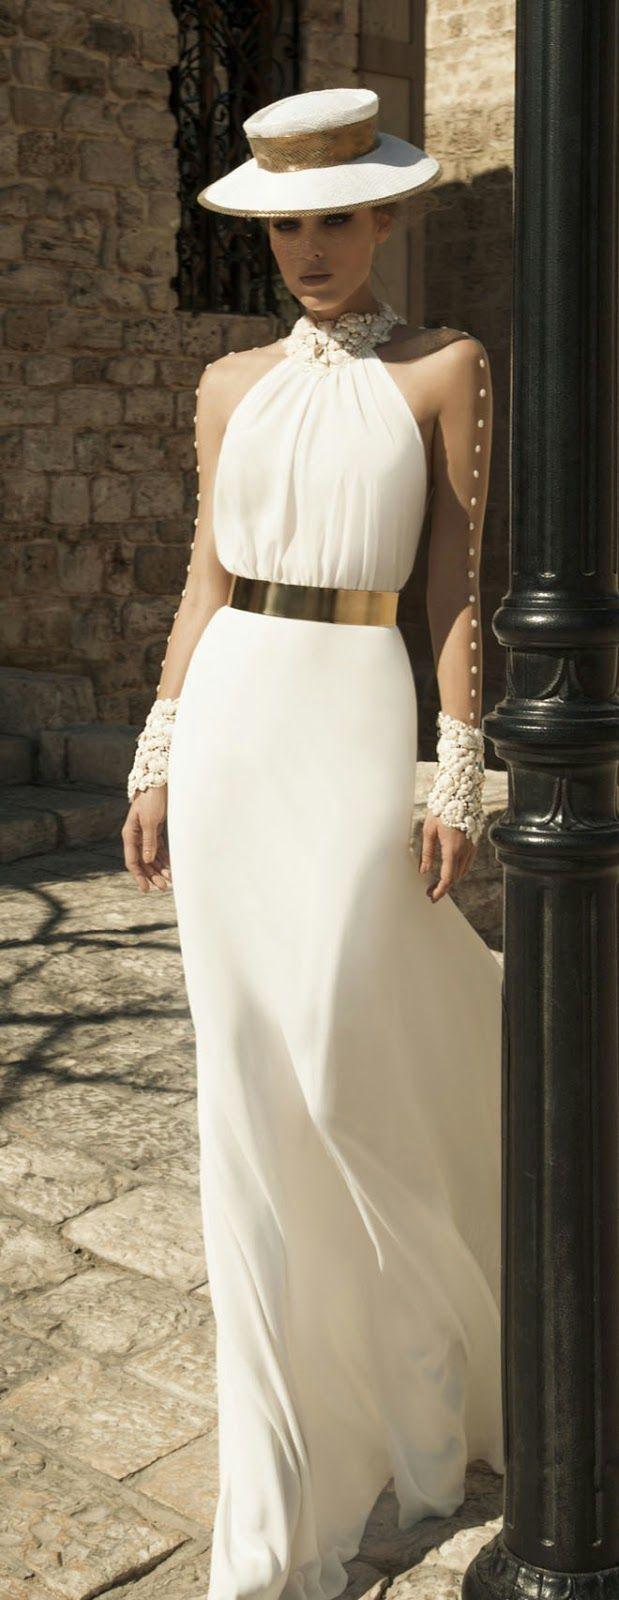 Gold belt for wedding dress  PANDORAloves the elegant us feel of this sheer chiffon wedding